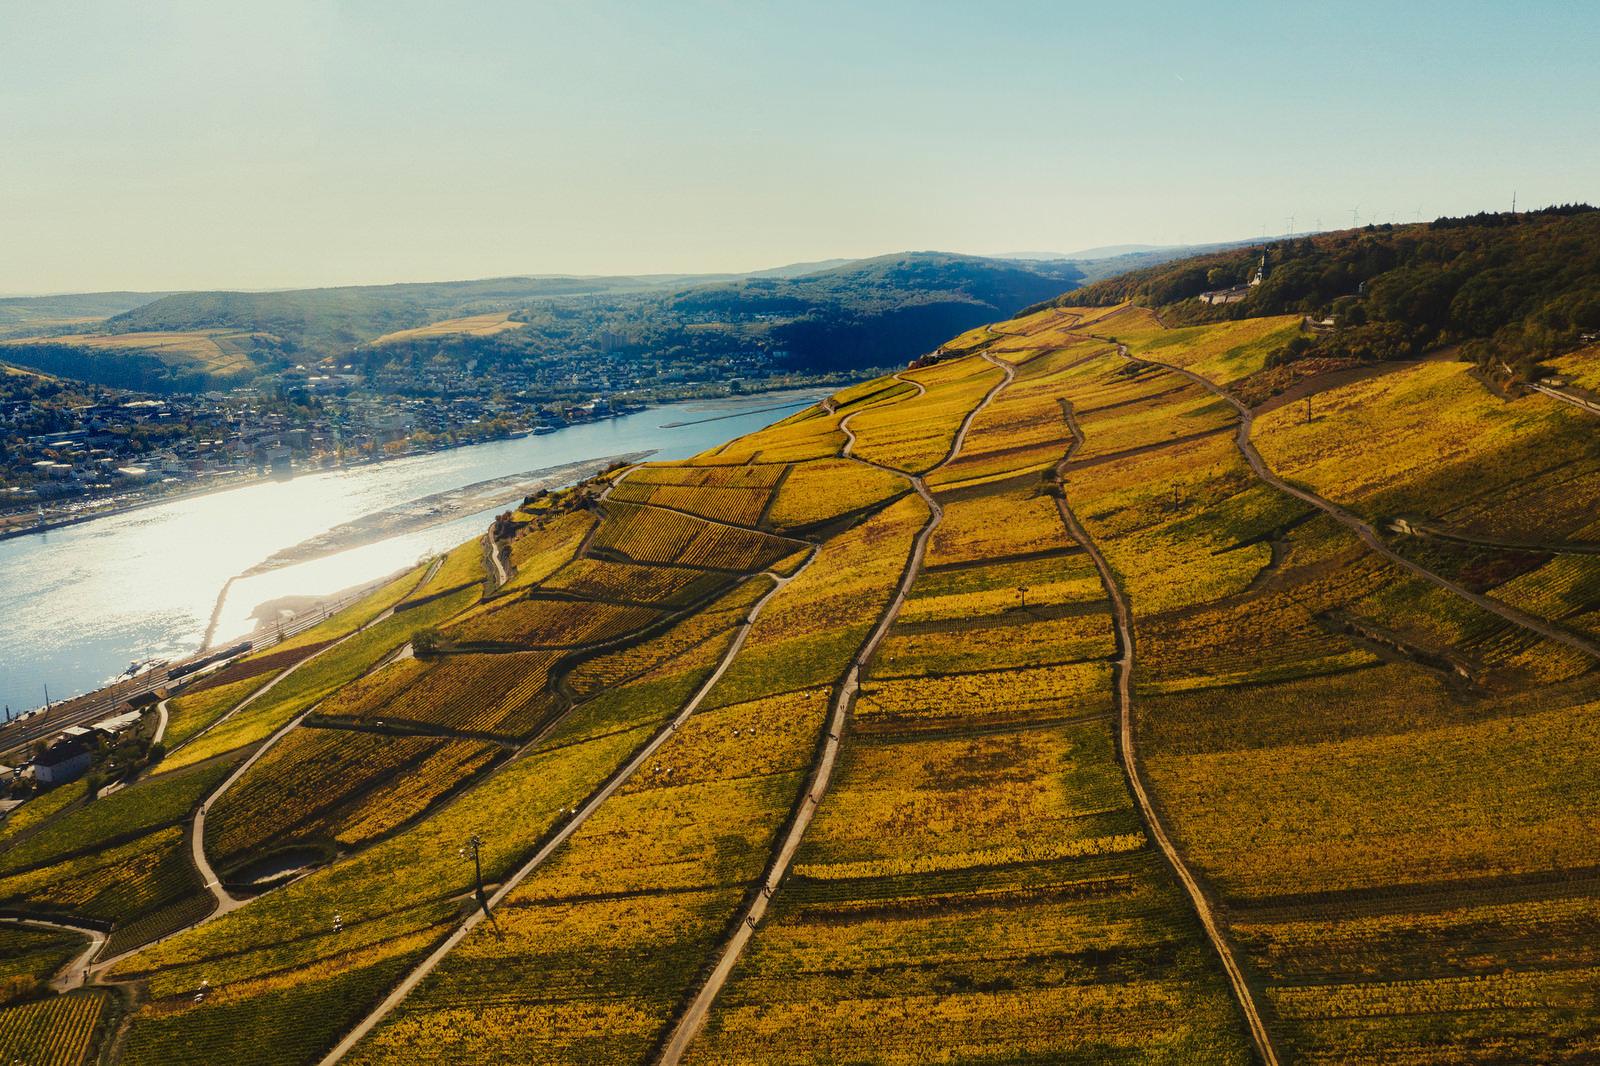 Landschaftsfotografie fotograf filmemacher frankfurt patrick schmetzer drohne landschaft natur 33